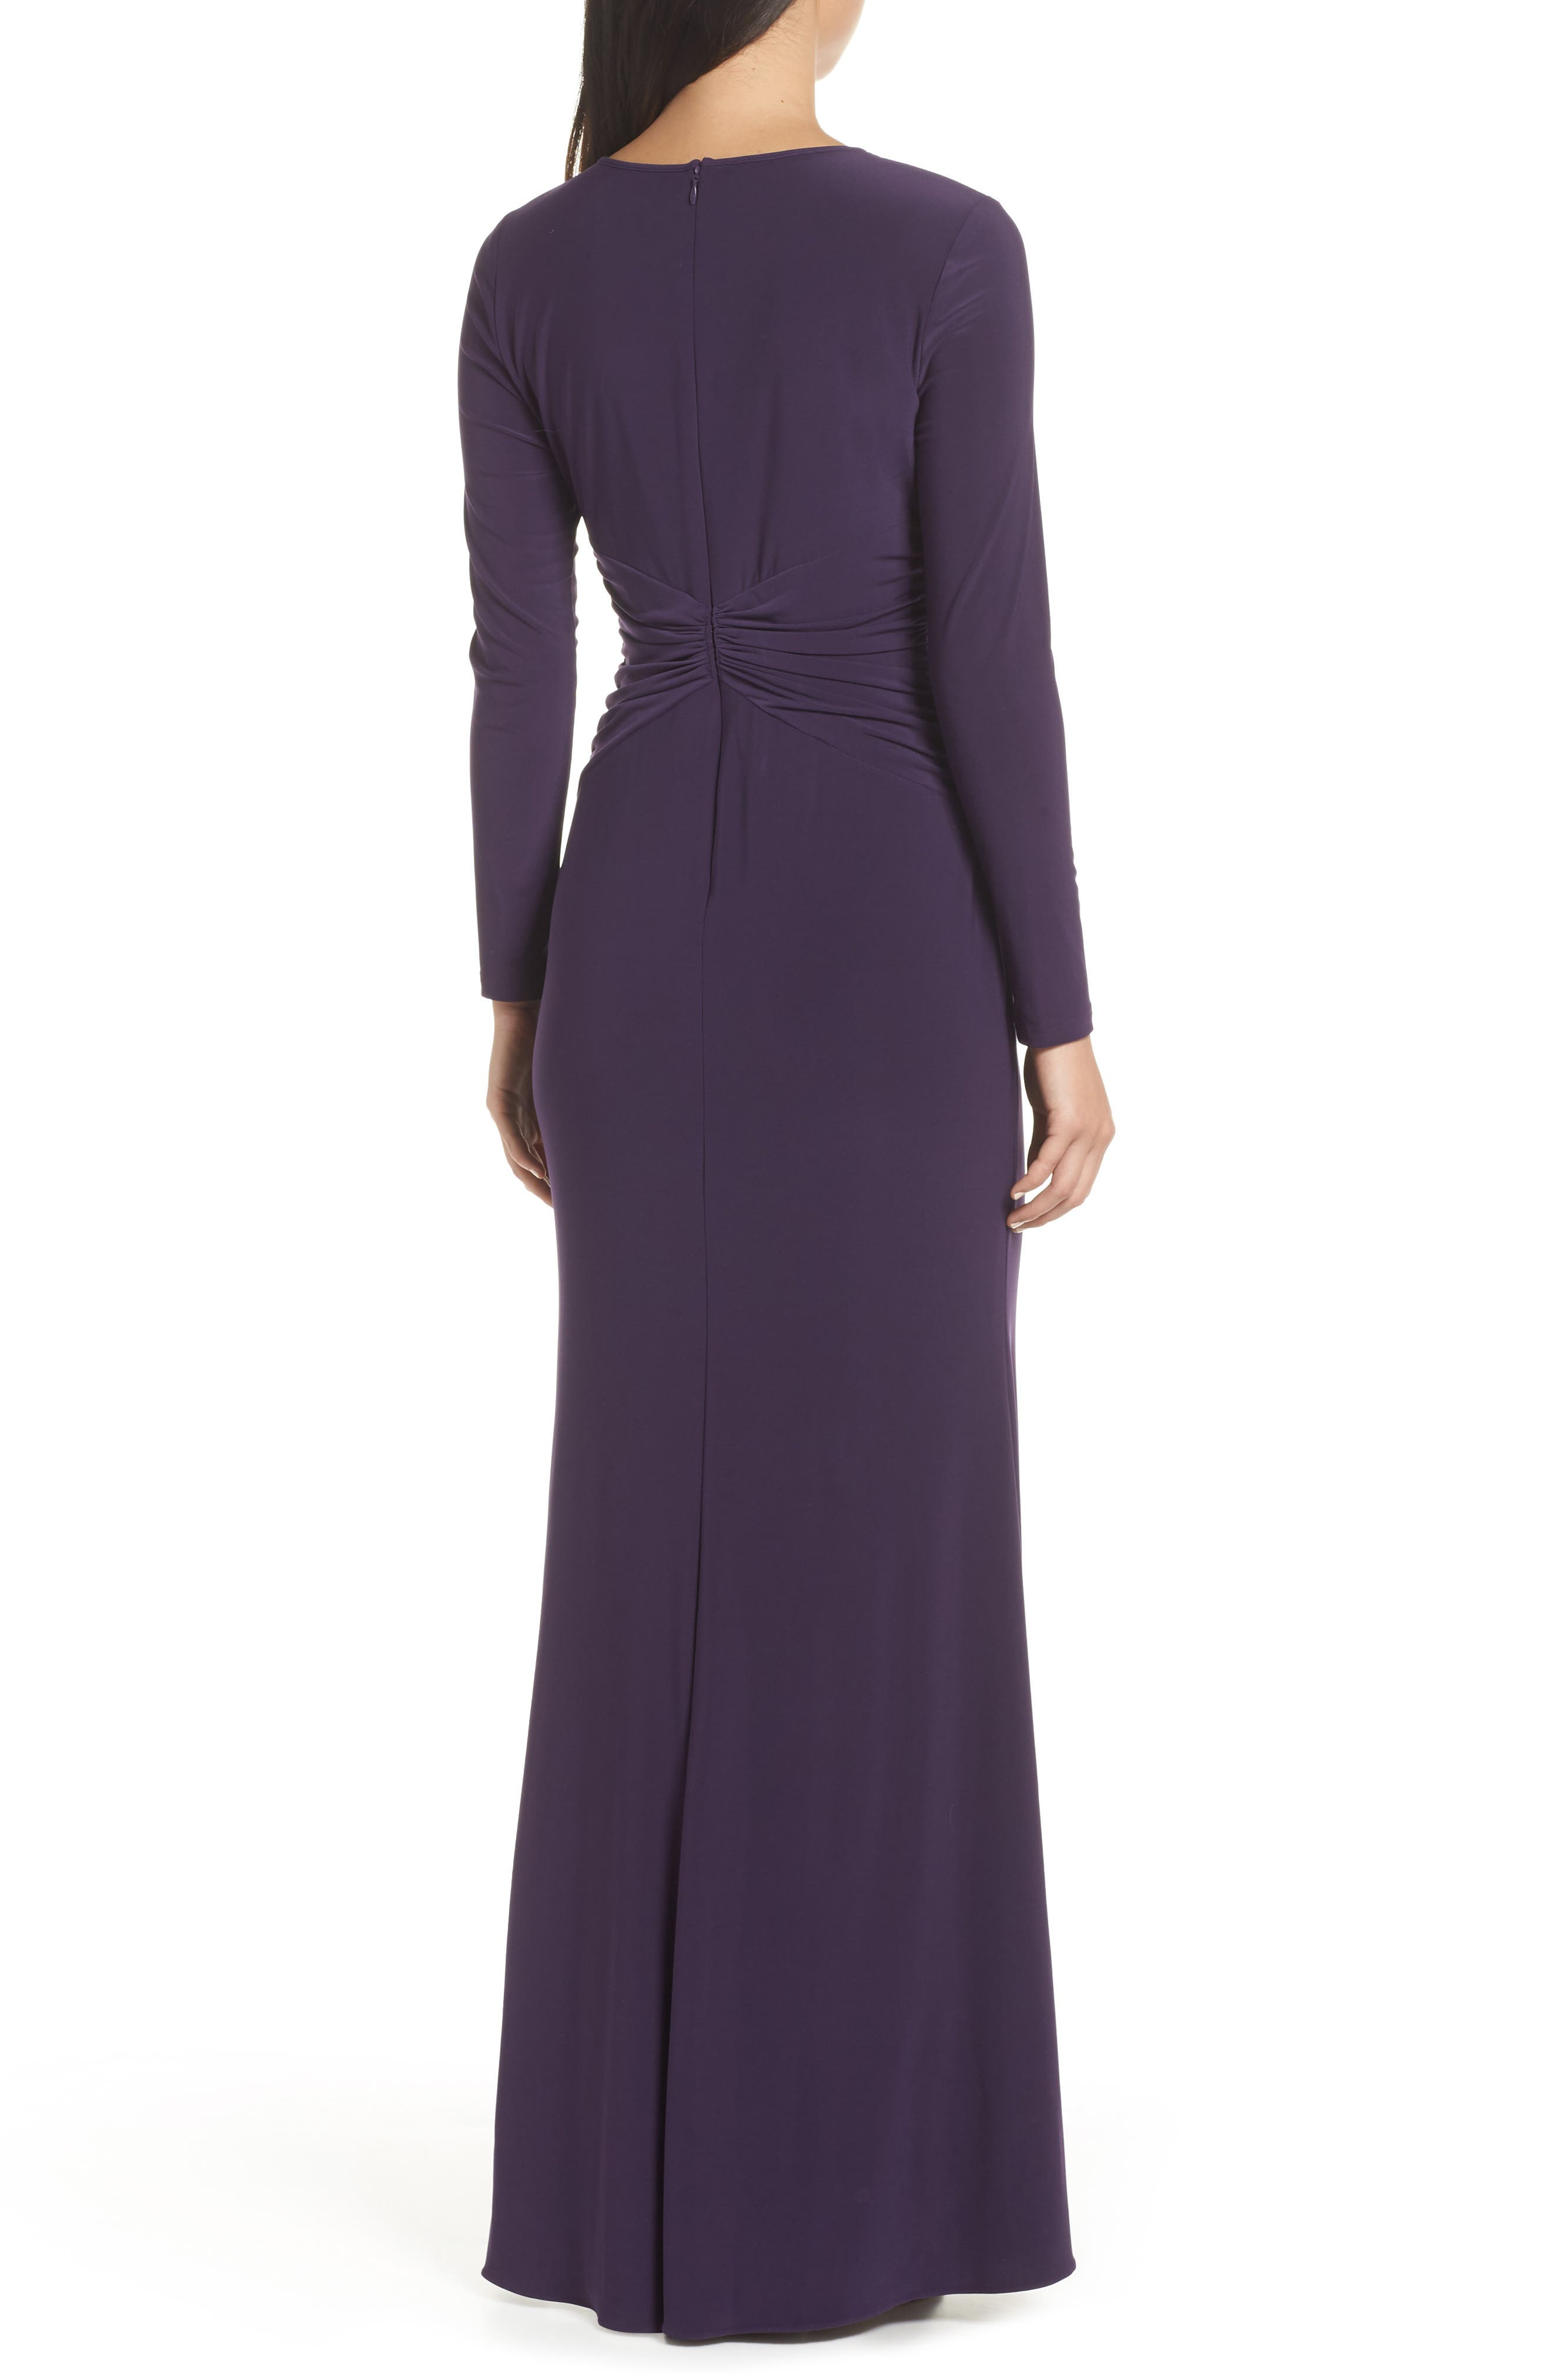 ADRIANNA PAPELL,                             Twist Waist Knit Dress,                             Alternate thumbnail 2, color,                             501